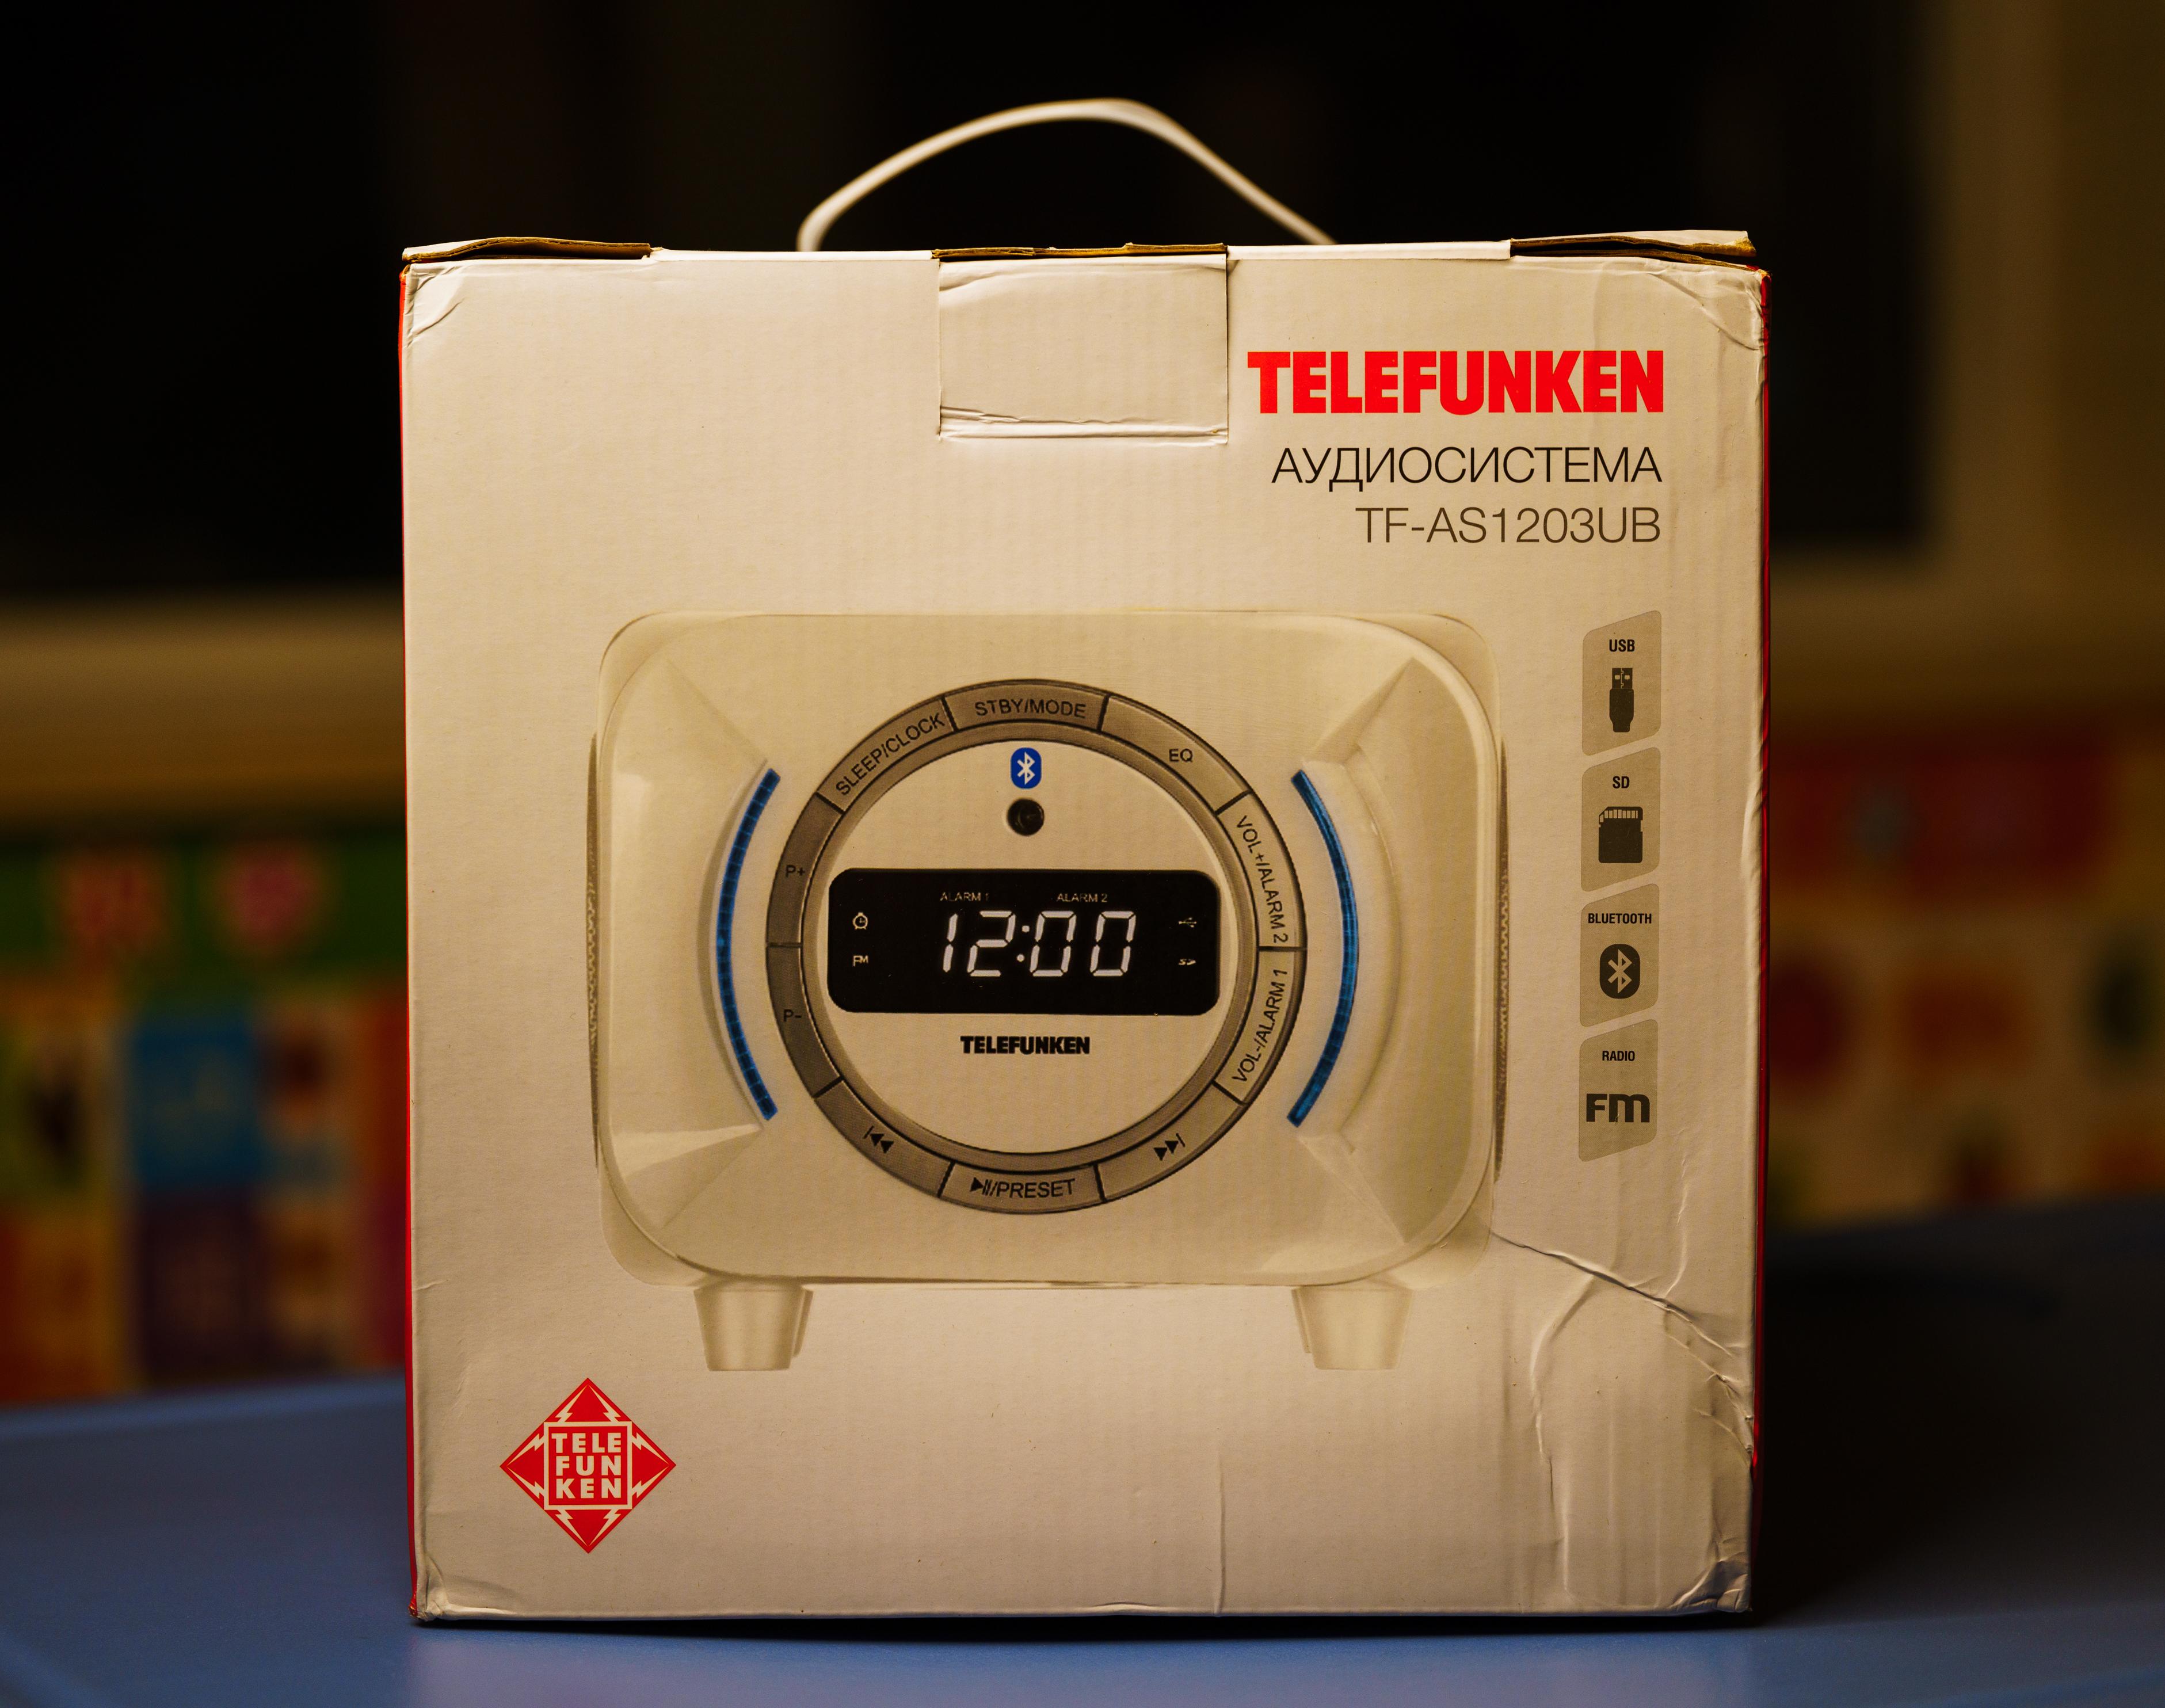 Telefunken百元级多功能蓝牙音箱开箱简测-爱扫货